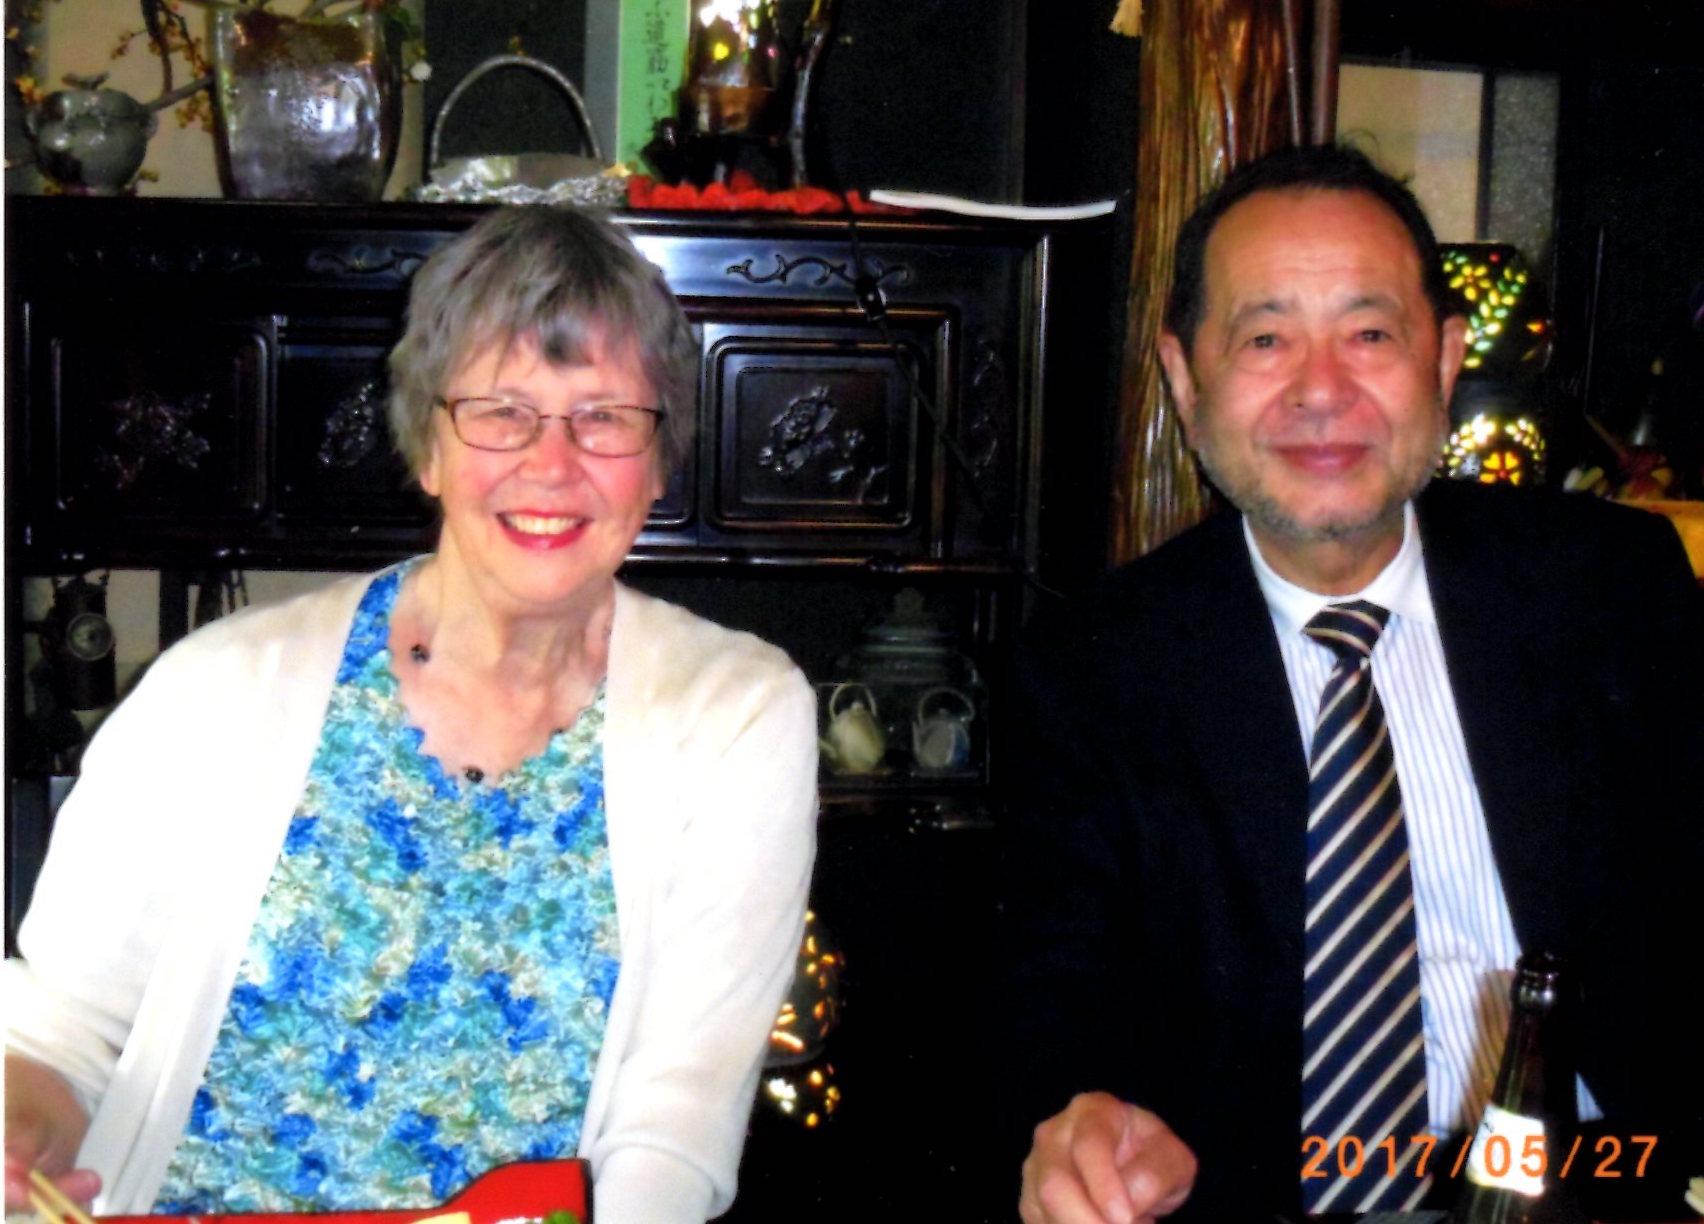 Author, Roberta Stephens and Afterword Author Mr. Komei Sasaki